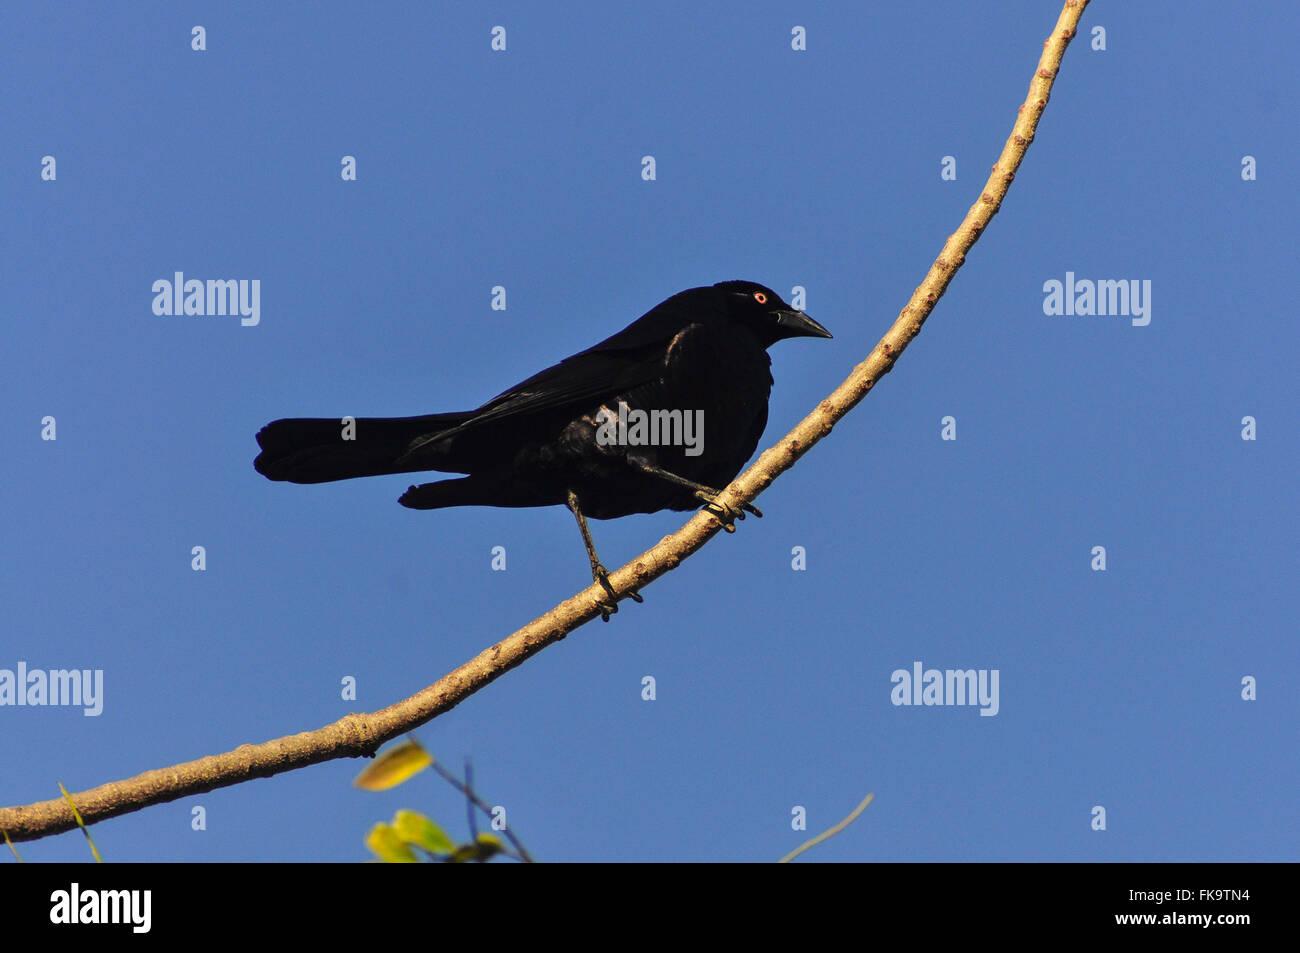 Grauna Zweig in das Pantanal Pocone Stockbild